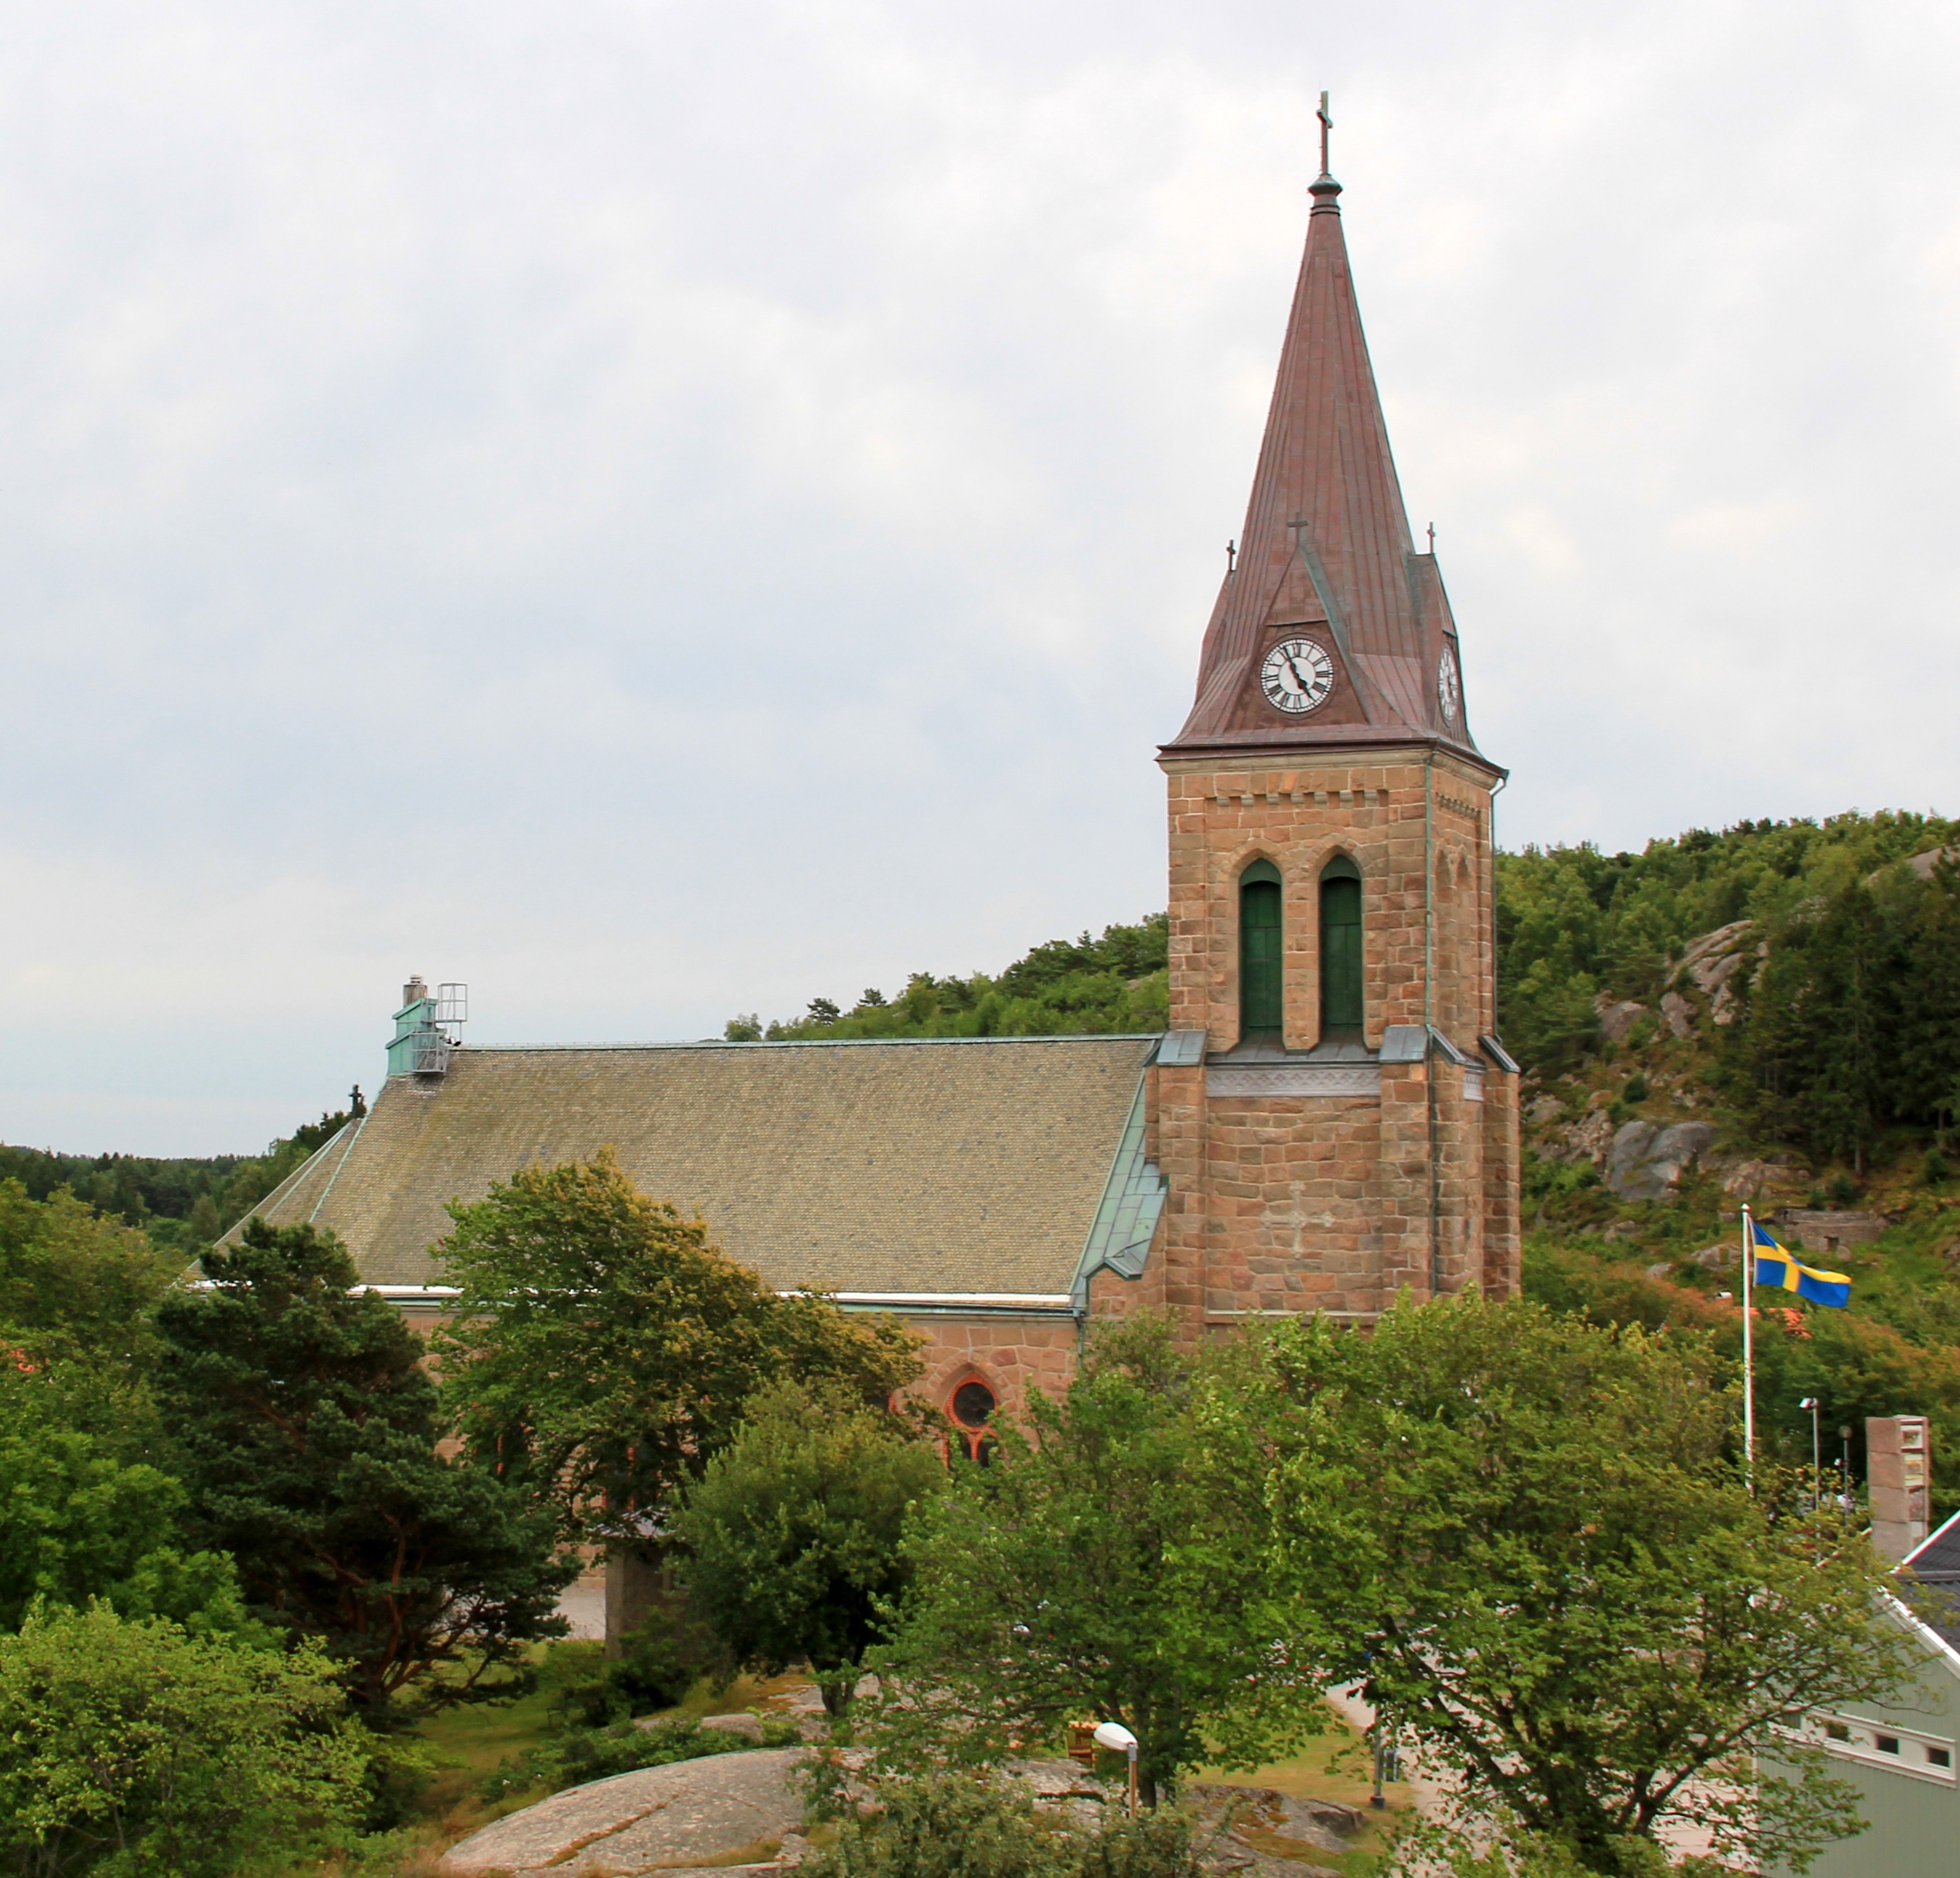 Fjällbacka in Sweden, the tiny seaside village where Läckberg was born